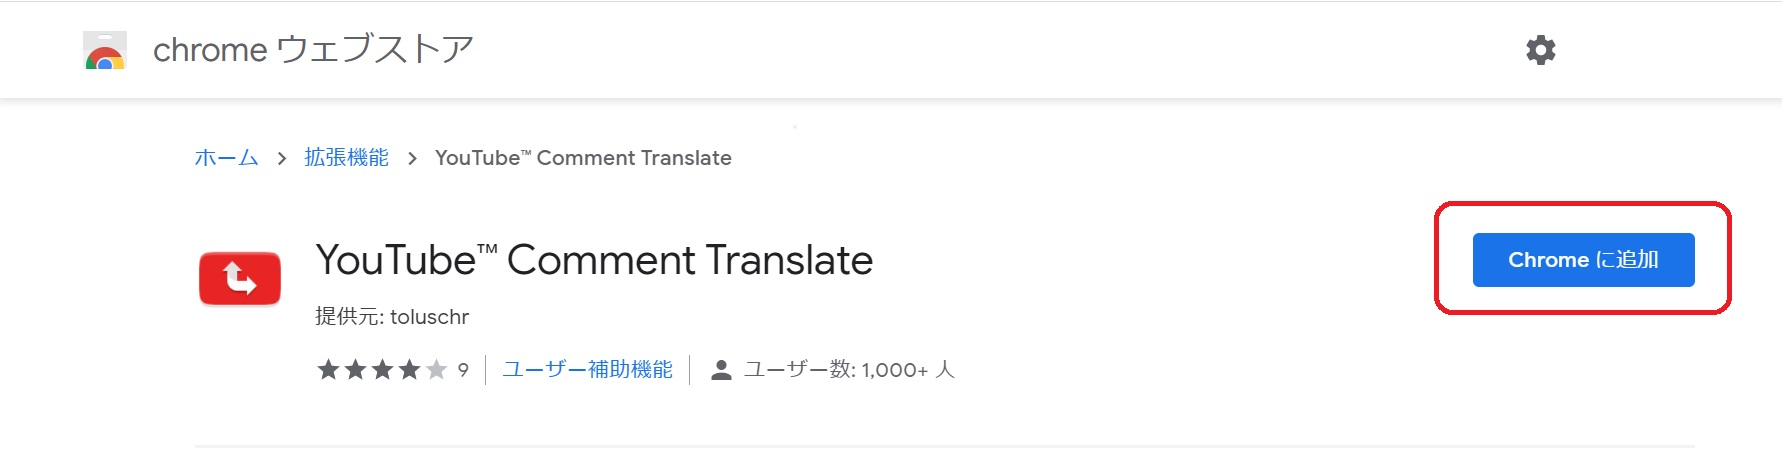 YouTube Comment Translateインストール